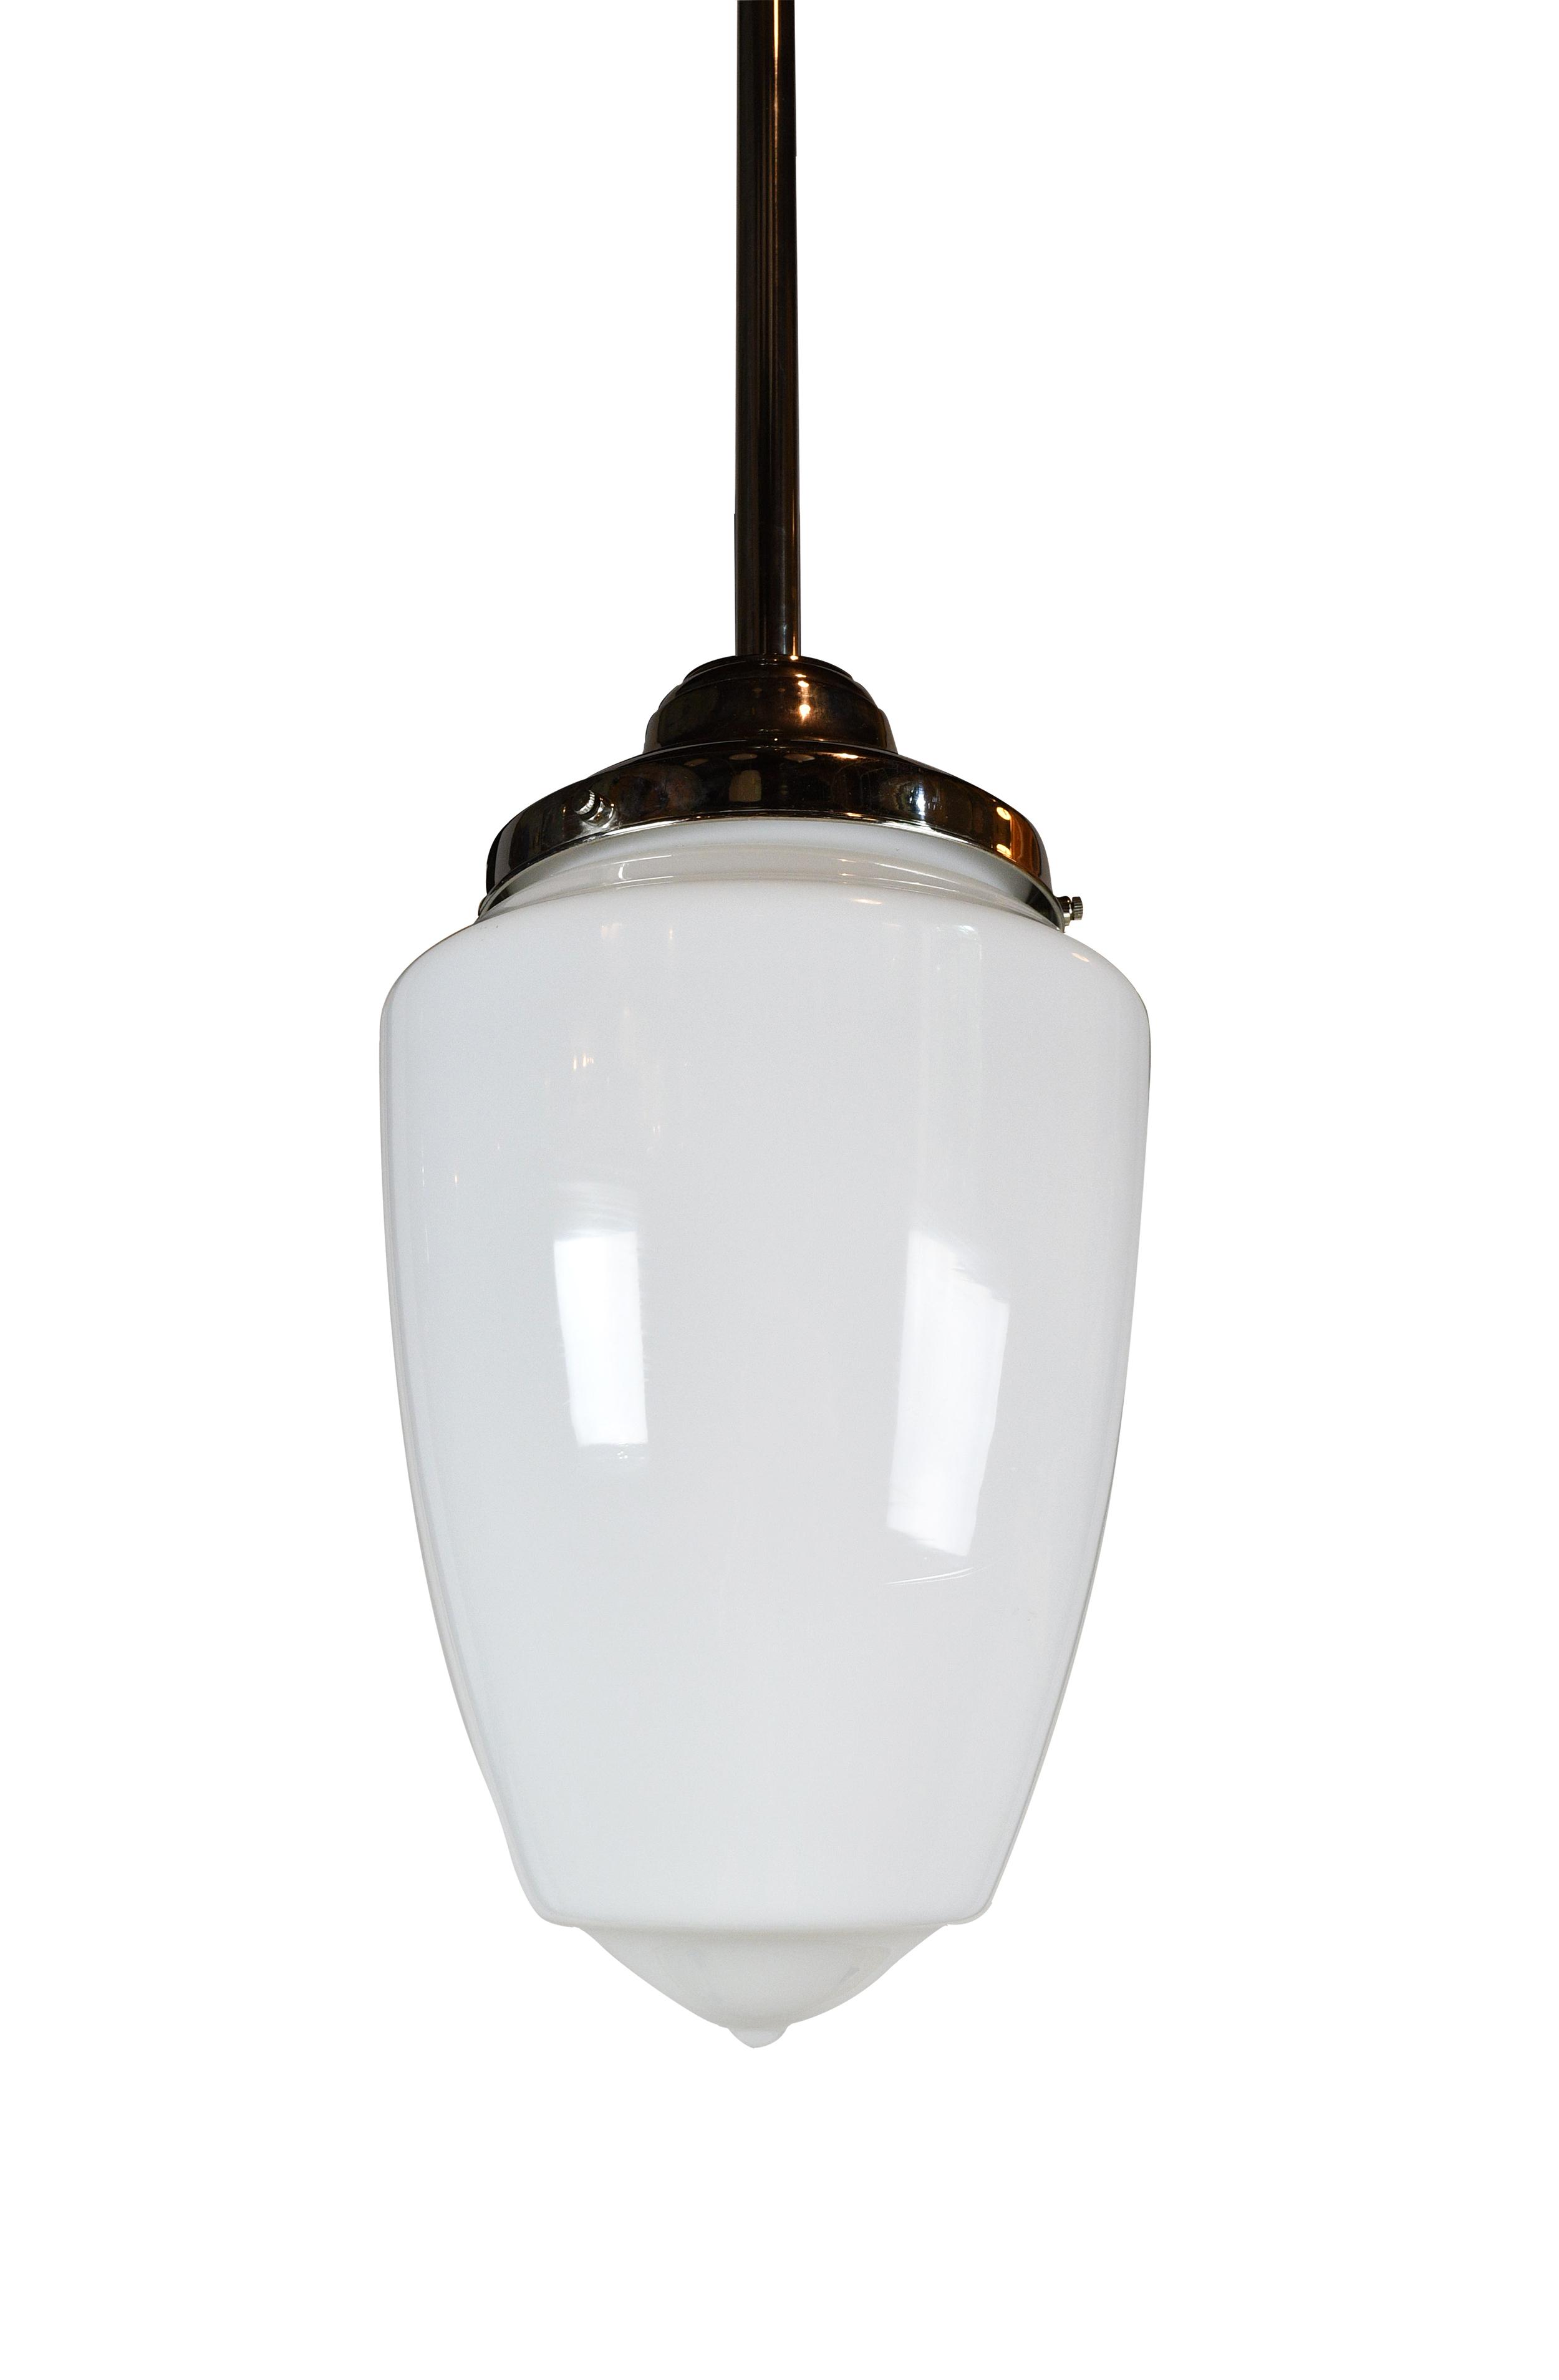 47867-nickel-milkglass-bullet-pendant-7.jpg